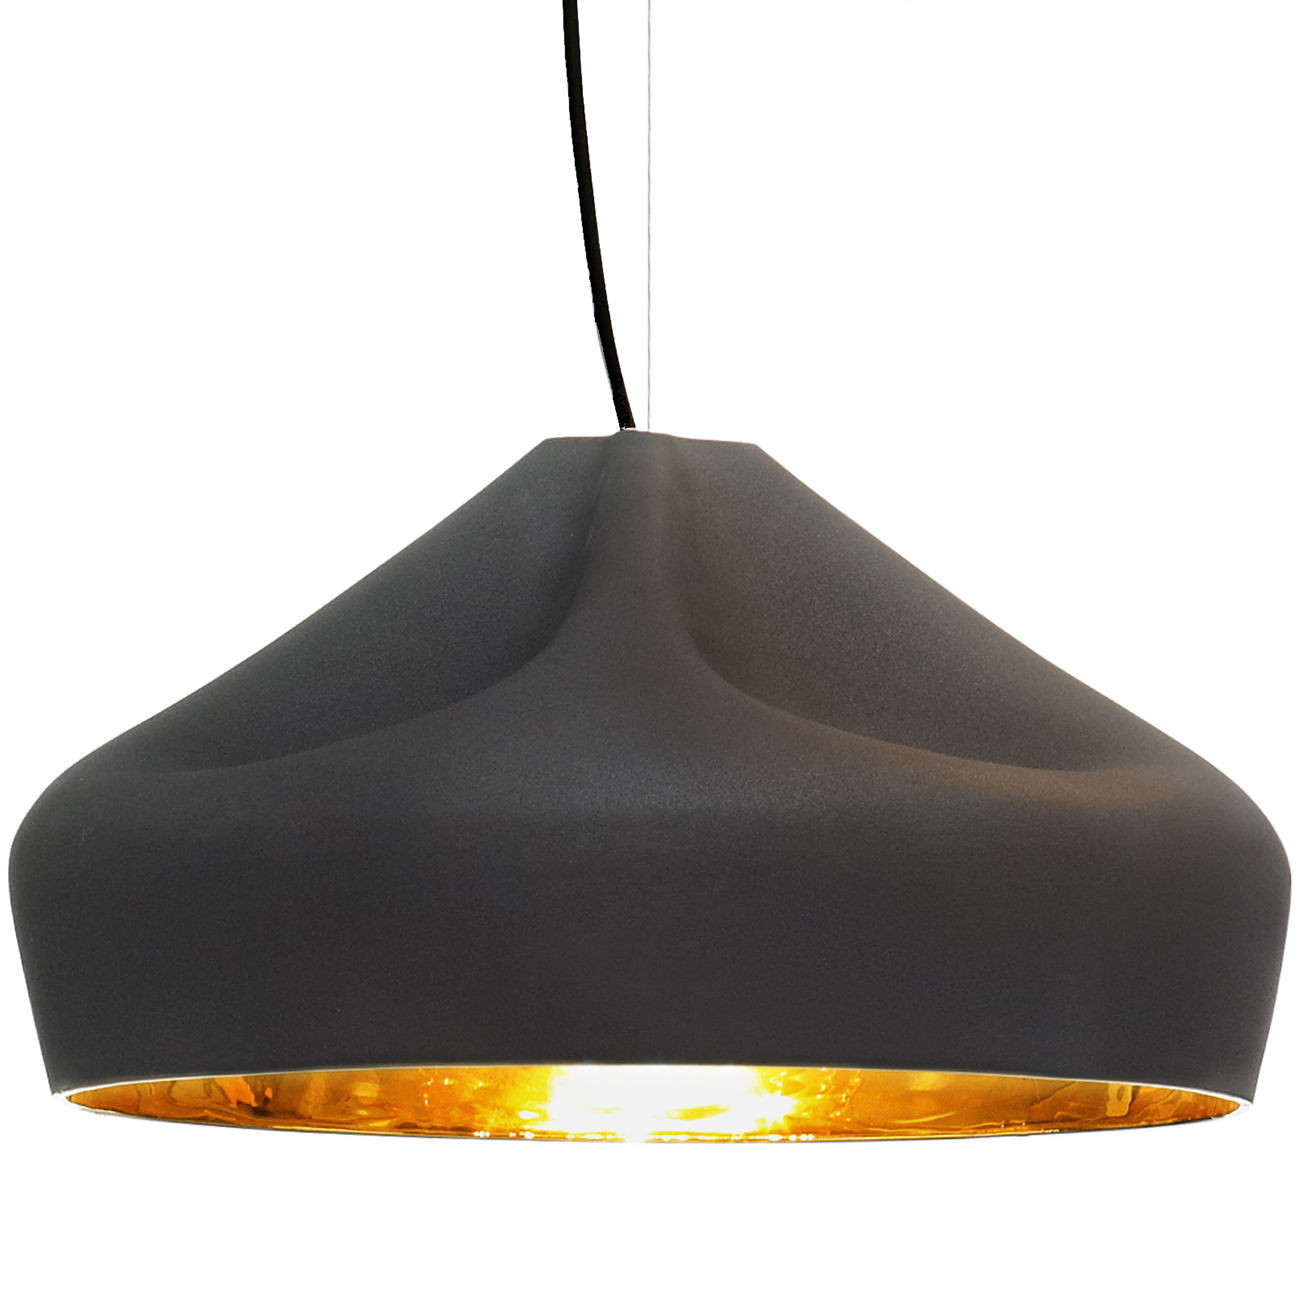 Pleat Box 47 hanglamp Marset zwart